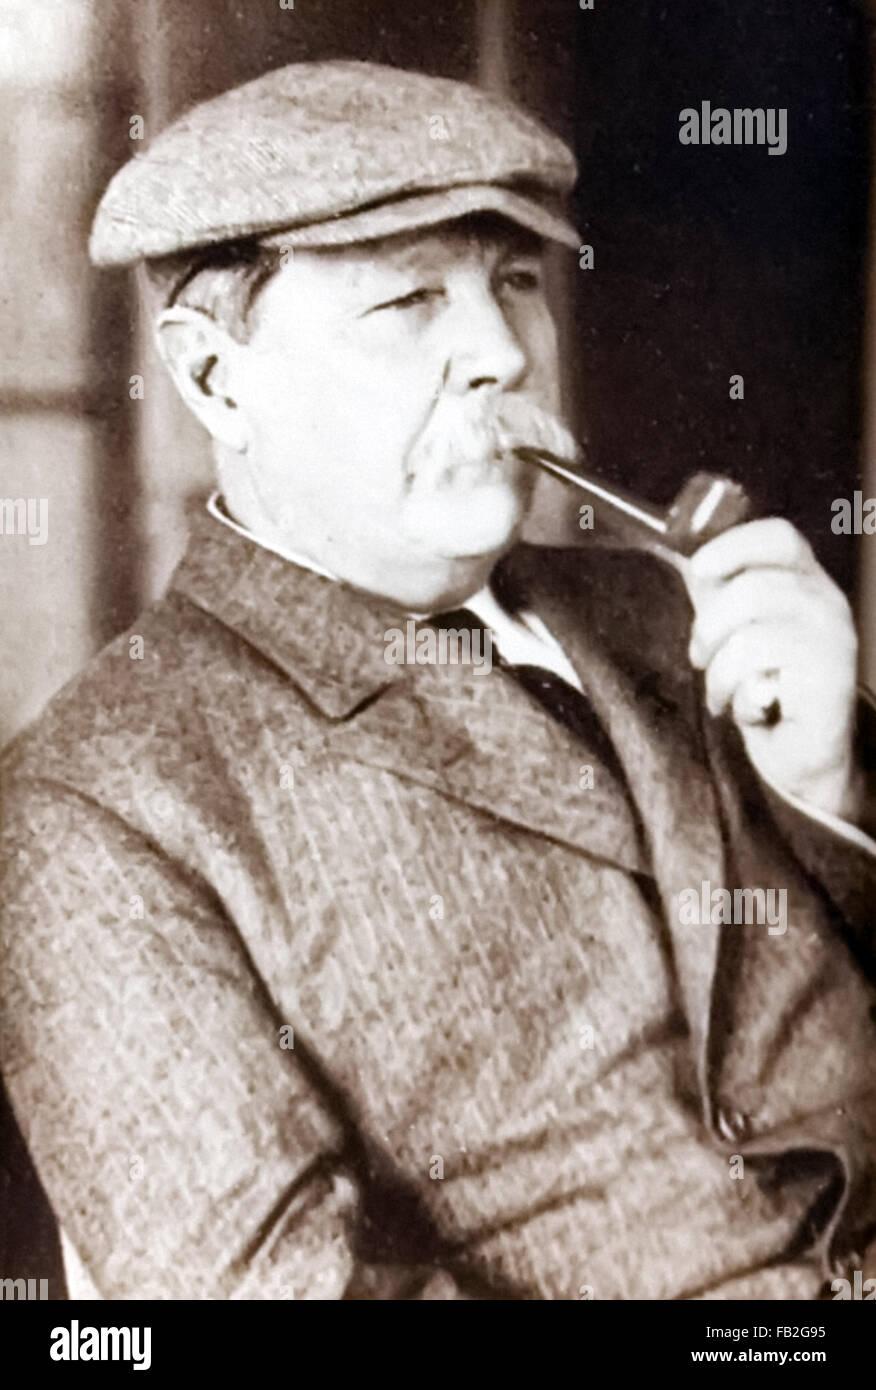 Sir Arthur Conan Doyle (1859-1930) British writer and creator of fictional detective Sherlock Holmes photographed - Stock Image